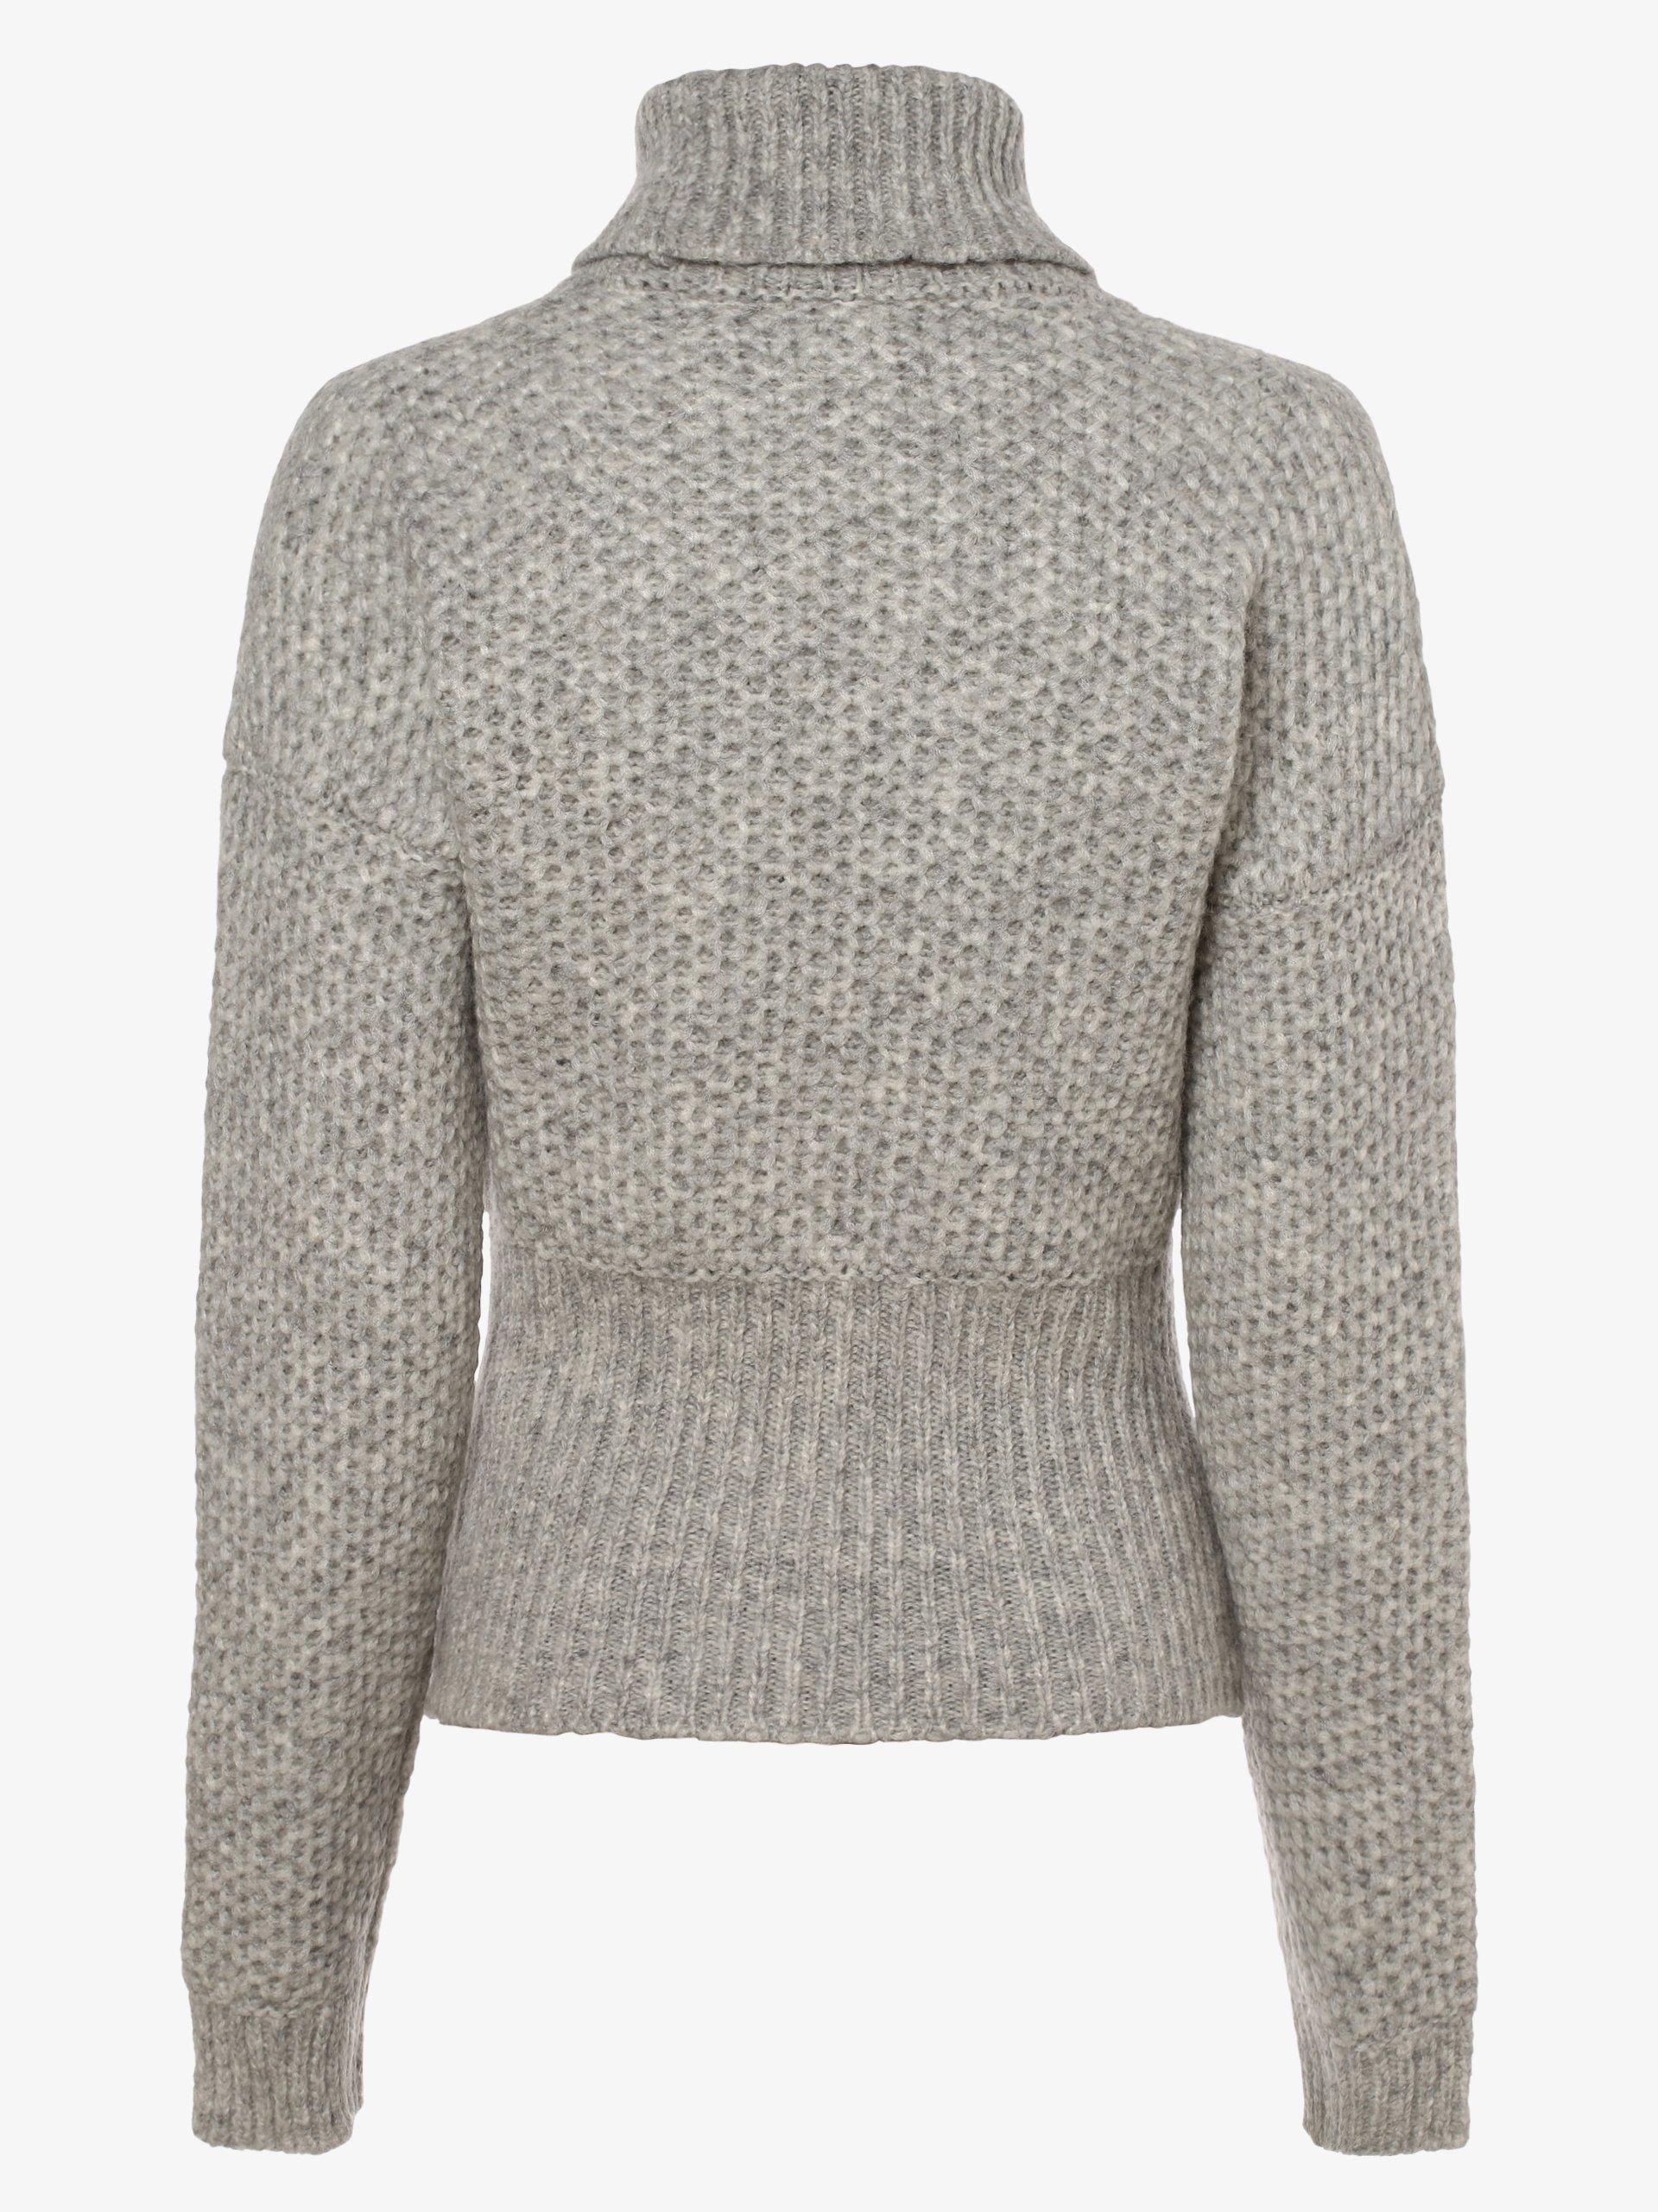 BOSS Casual Damen Pullover mit Alpaka-Anteil - Ifullum